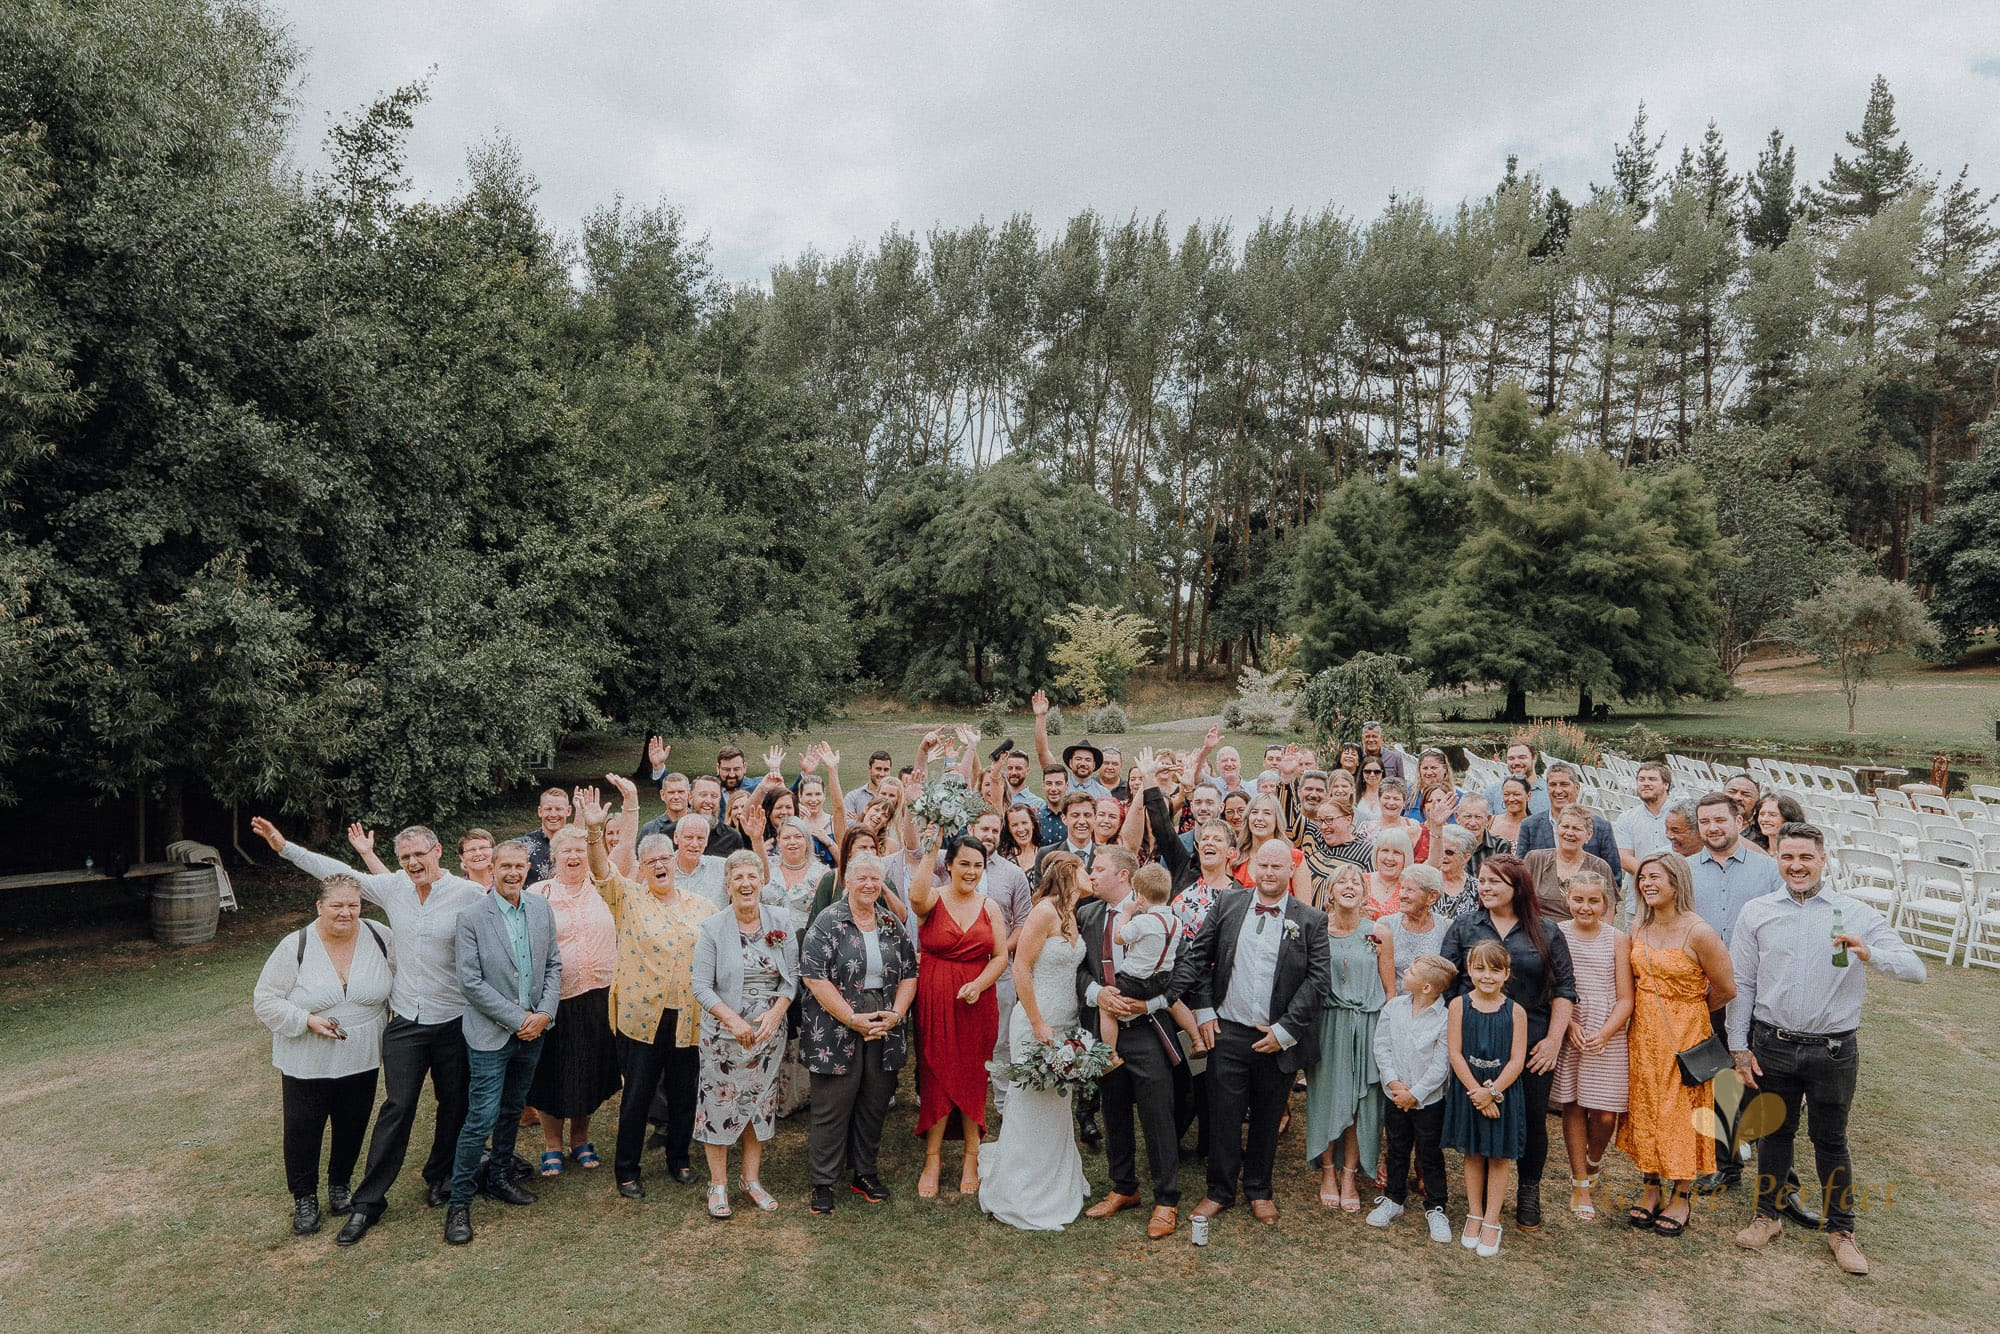 Roseburb Park wedding of Casey 1696